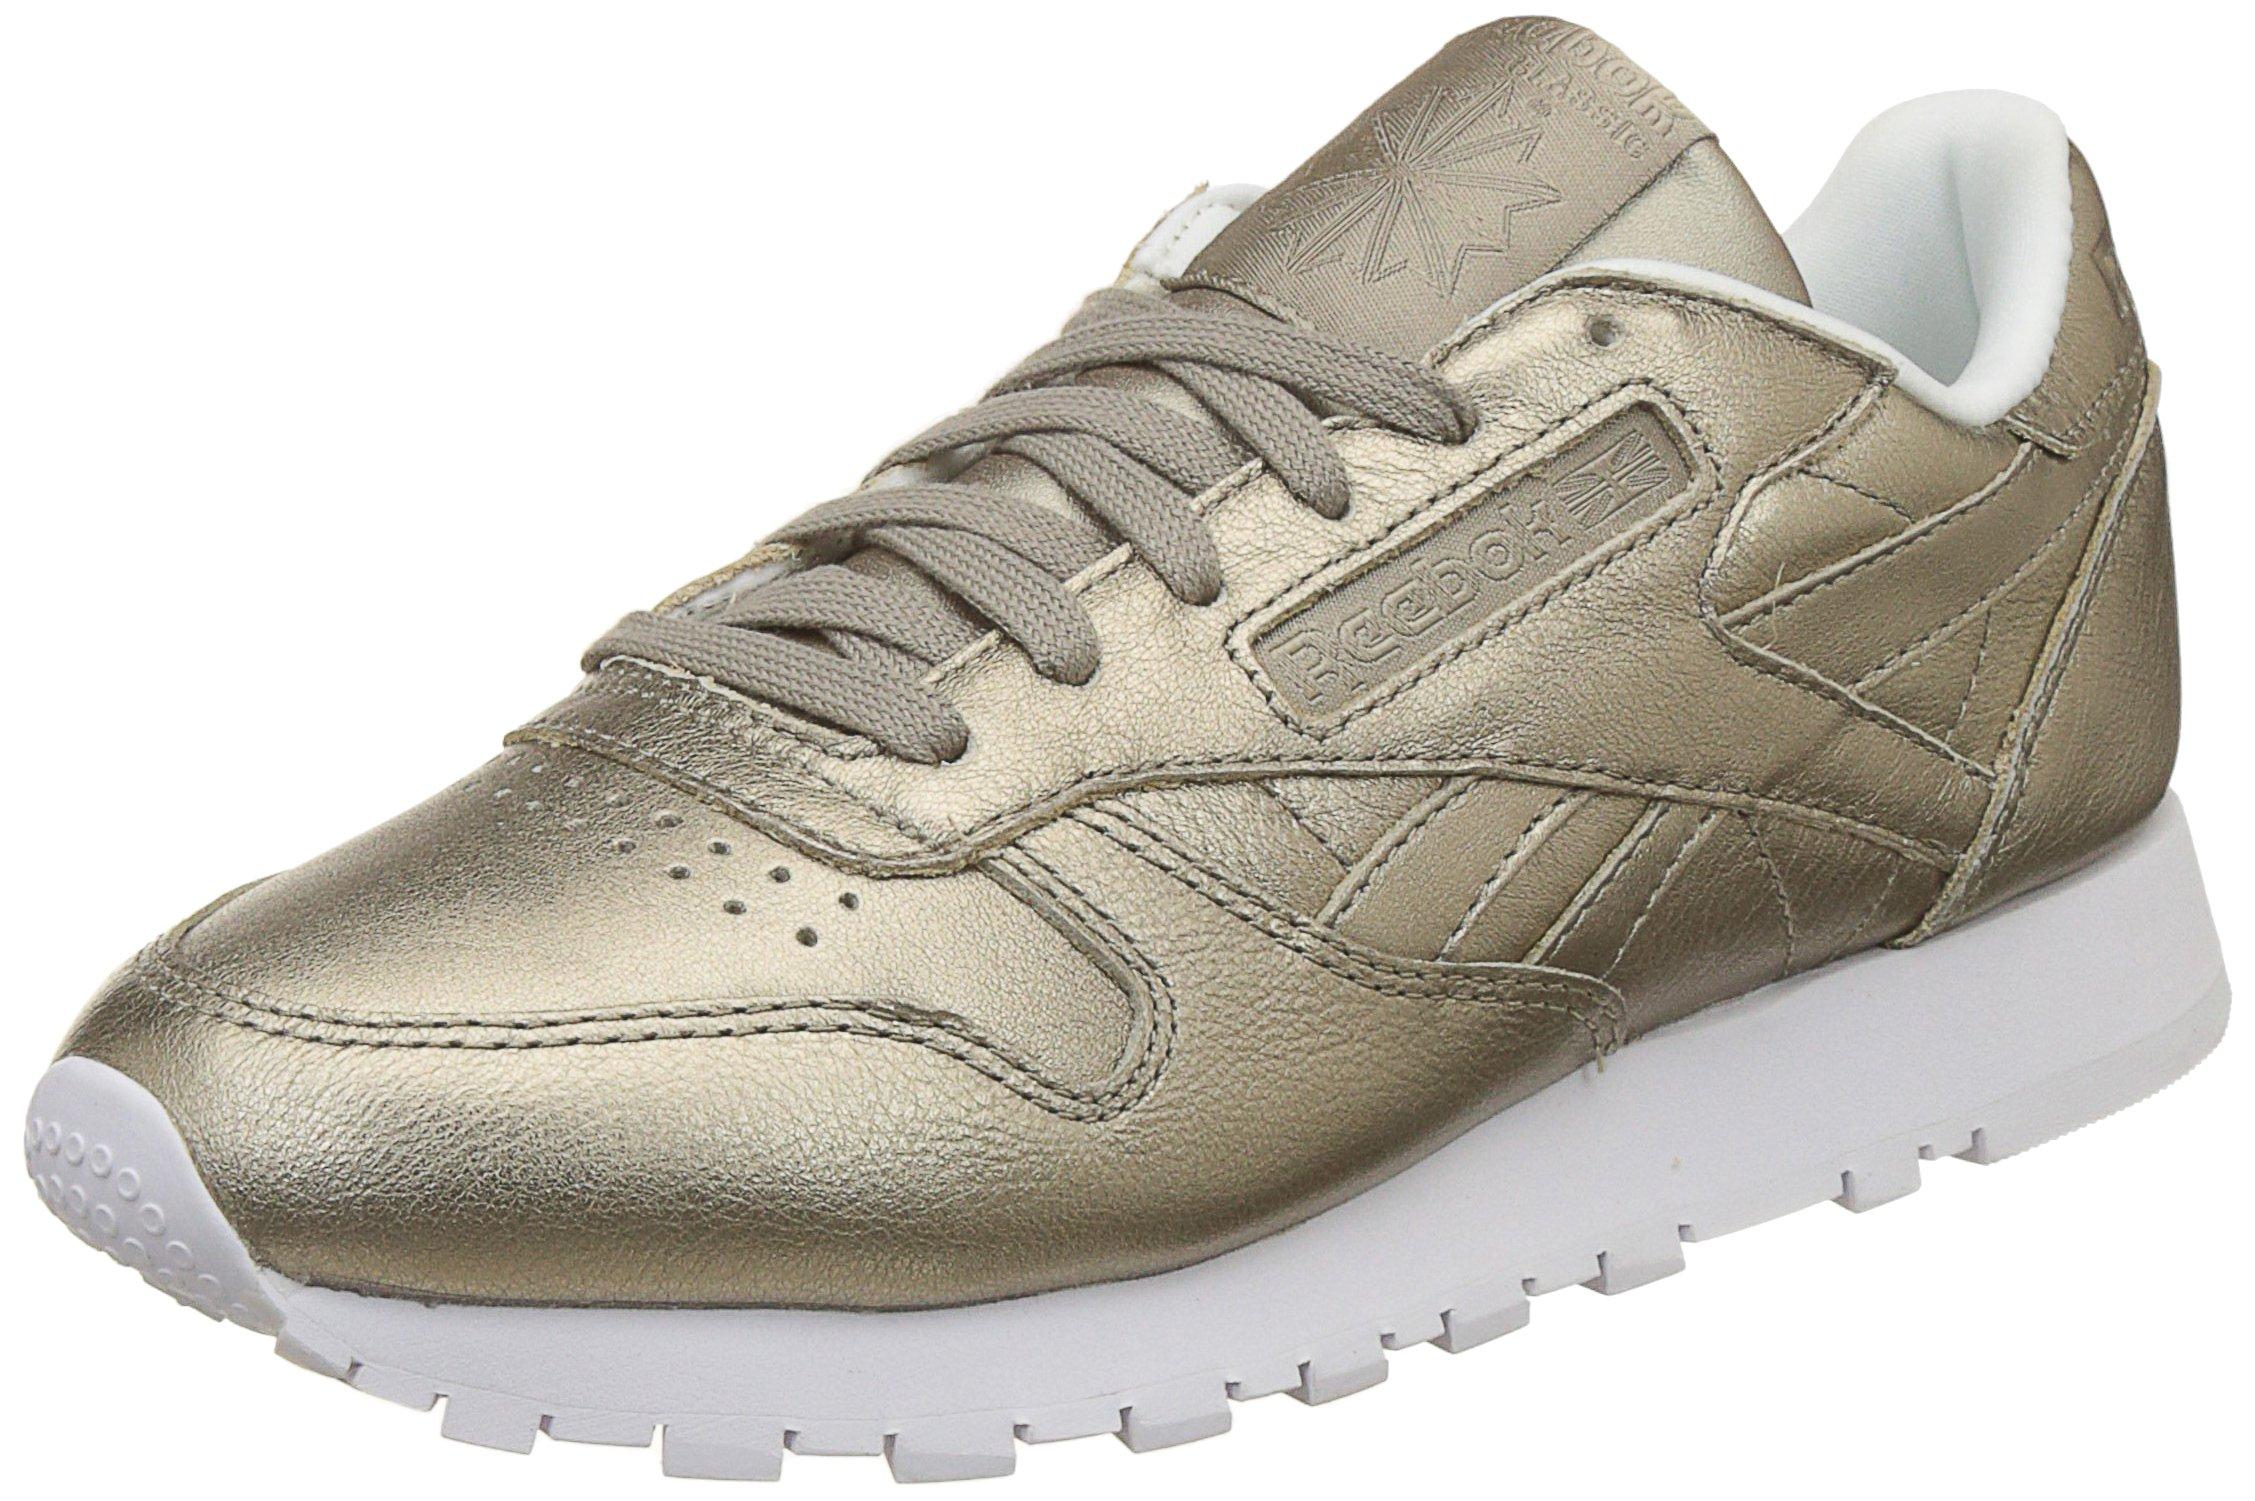 LBasses Eu4 FemmeOrpearl Leather white37 Reebok Uk grey Classic Met Gold lJKFc1